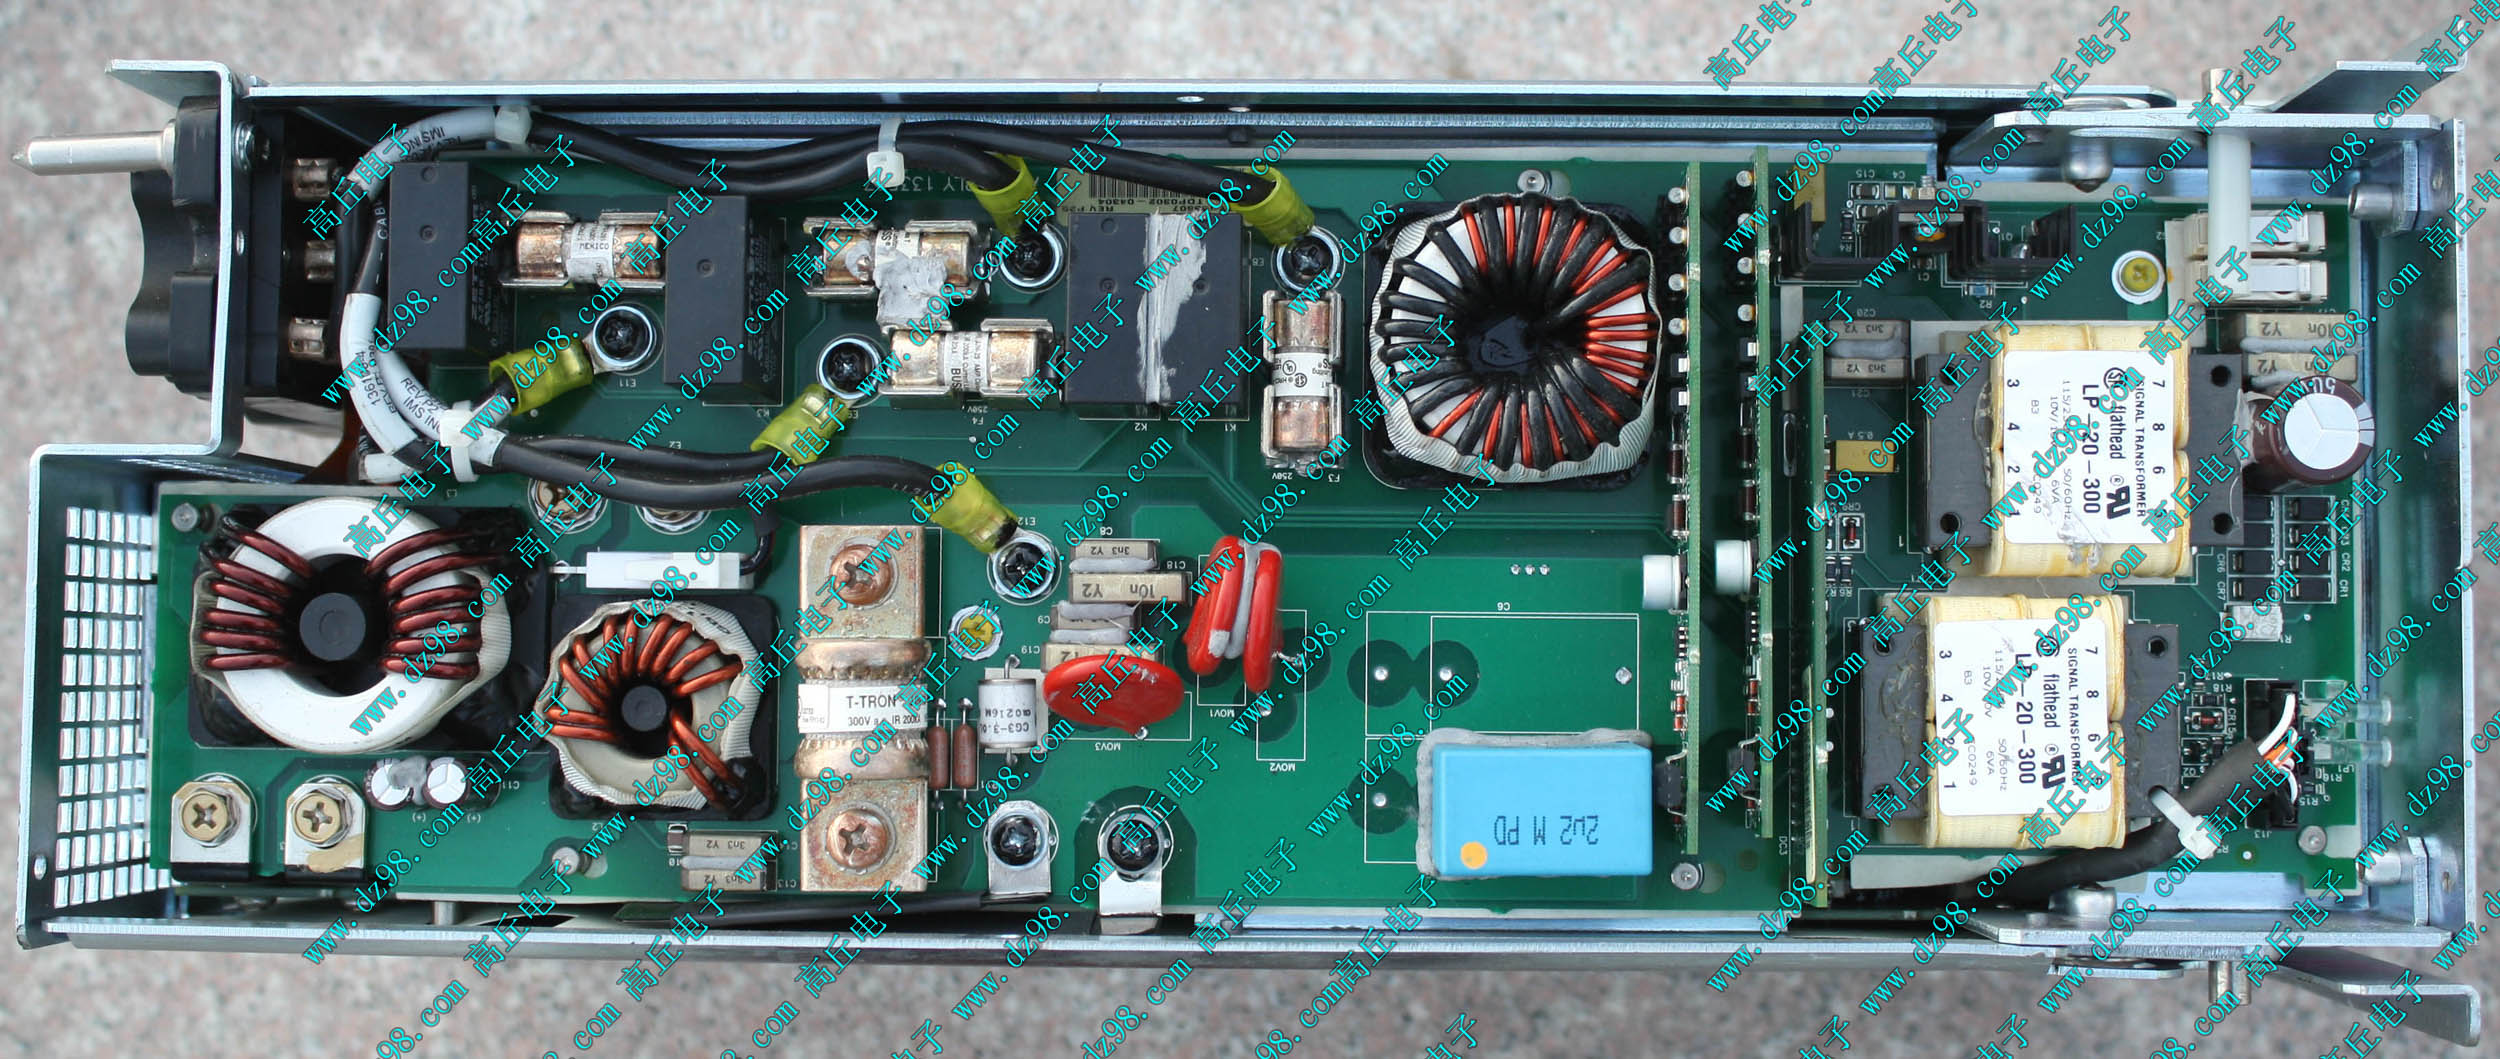 dc-dc开关电源 小功率多路电源 大功率多路电源